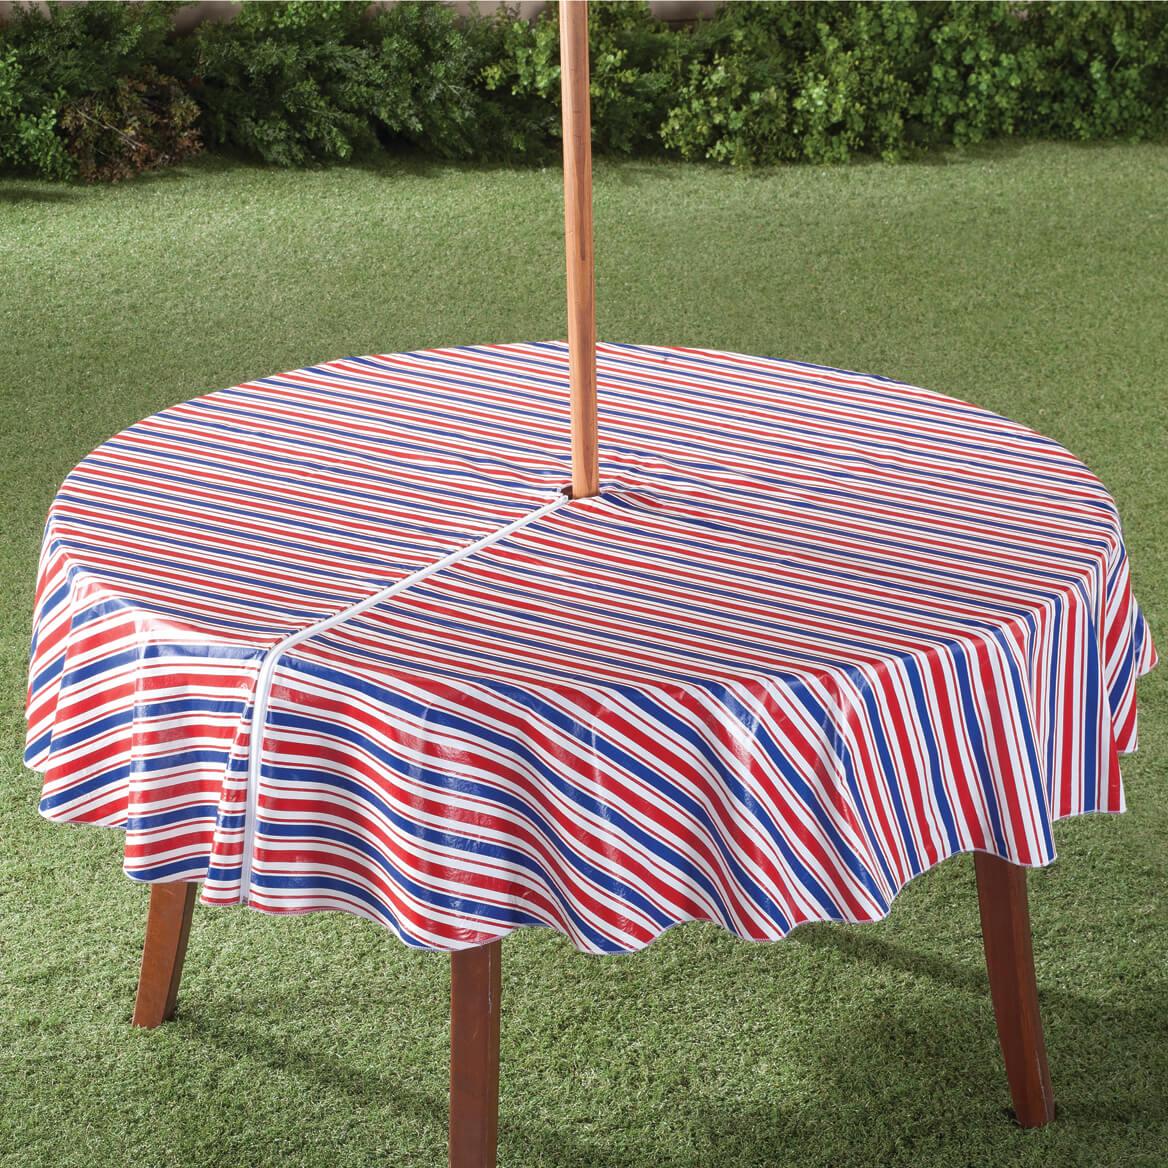 Patio Umbrella Covers With Zipper: Patriotic Zippered Umbrella Table Cover